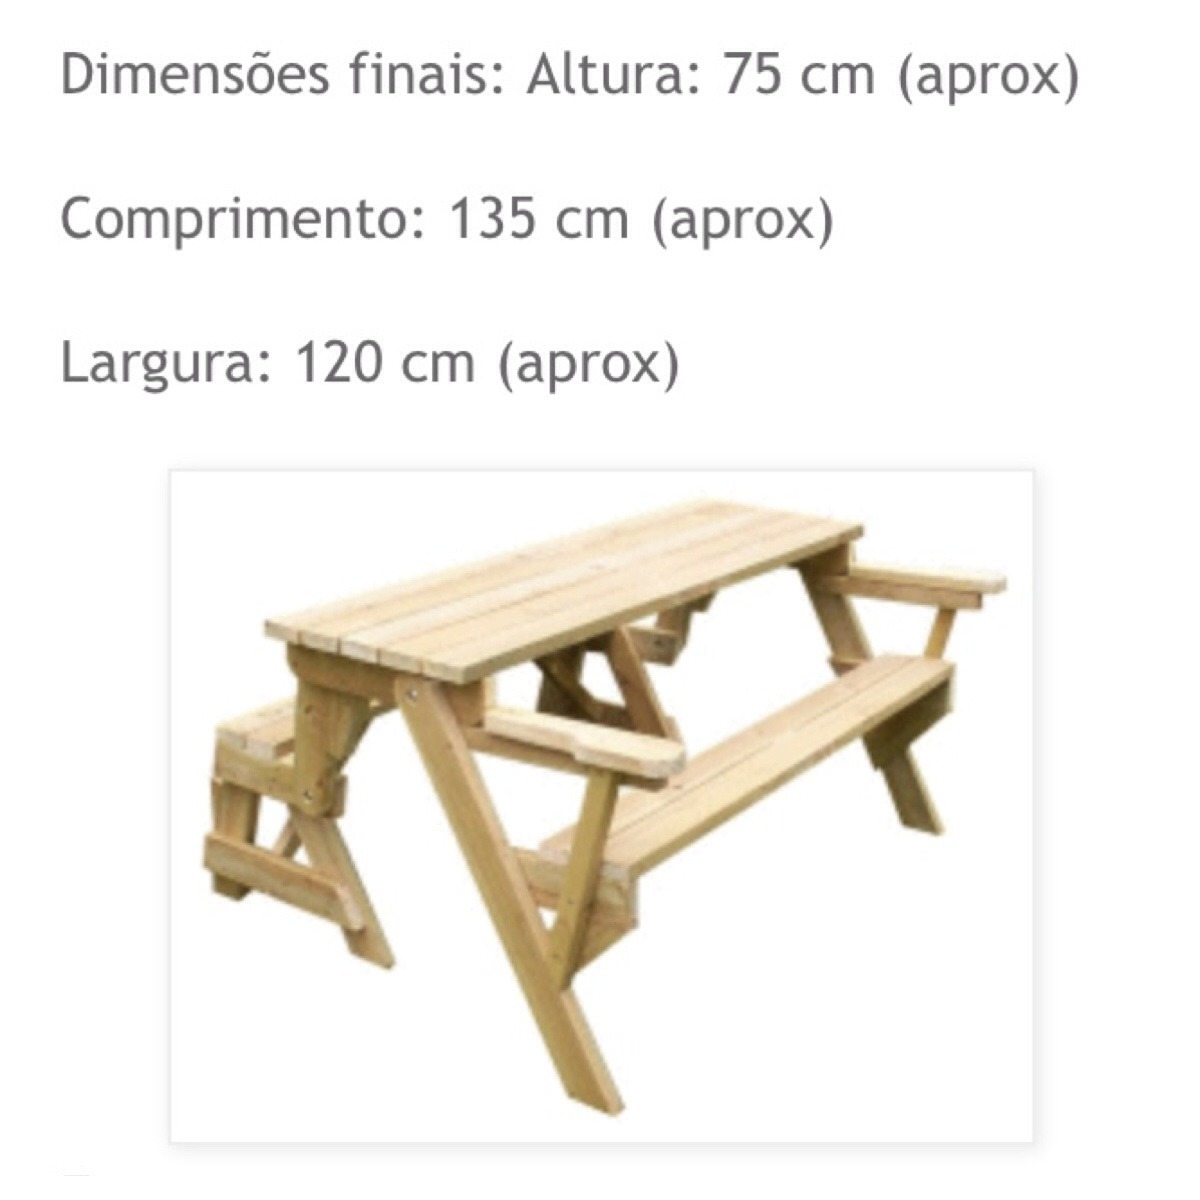 banco vira mesa picnic churrasco mesa #493918 1200x1200